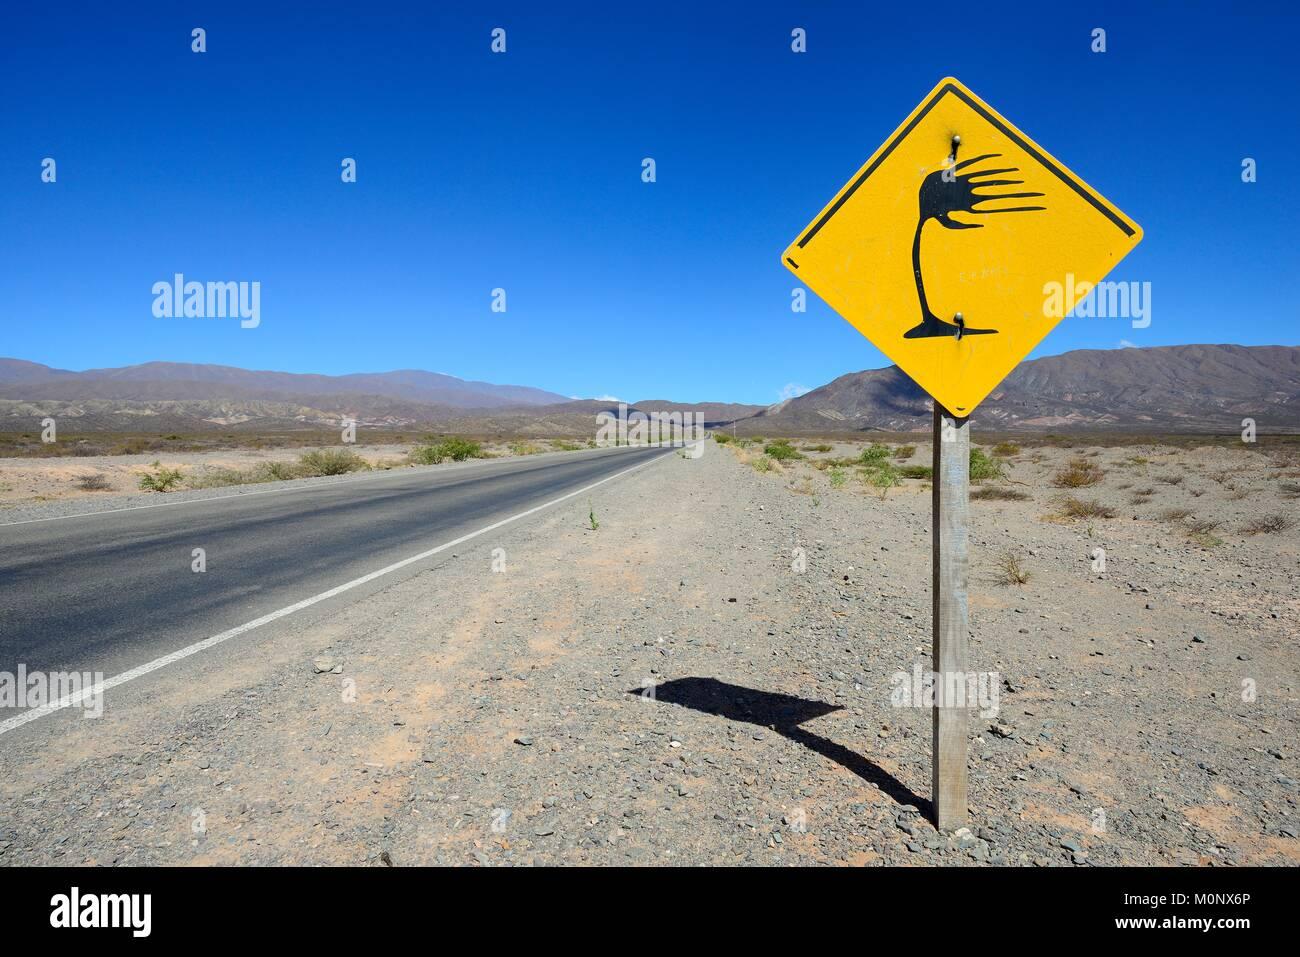 Warning Sign Crosswind At Rp 33 Near Cachi Salta Argentina Stock